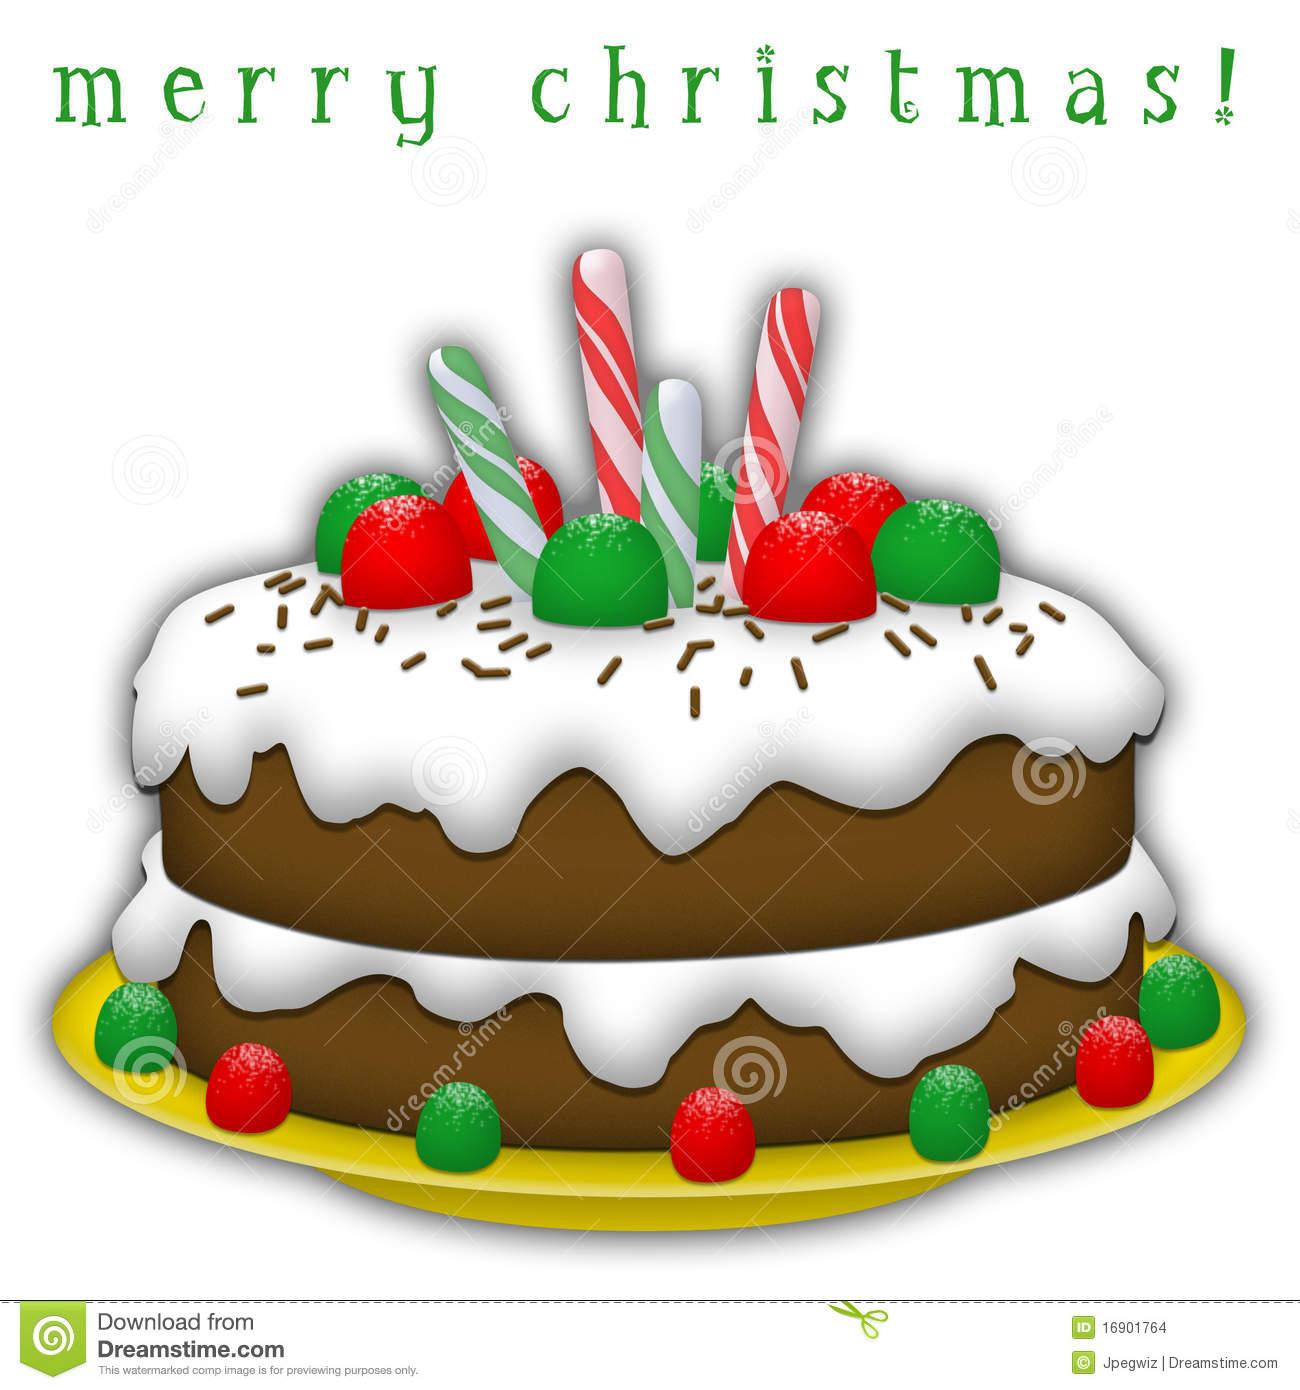 Christmas birthday cake clip art jpg free library Free christmas cake clipart - ClipartFest jpg free library